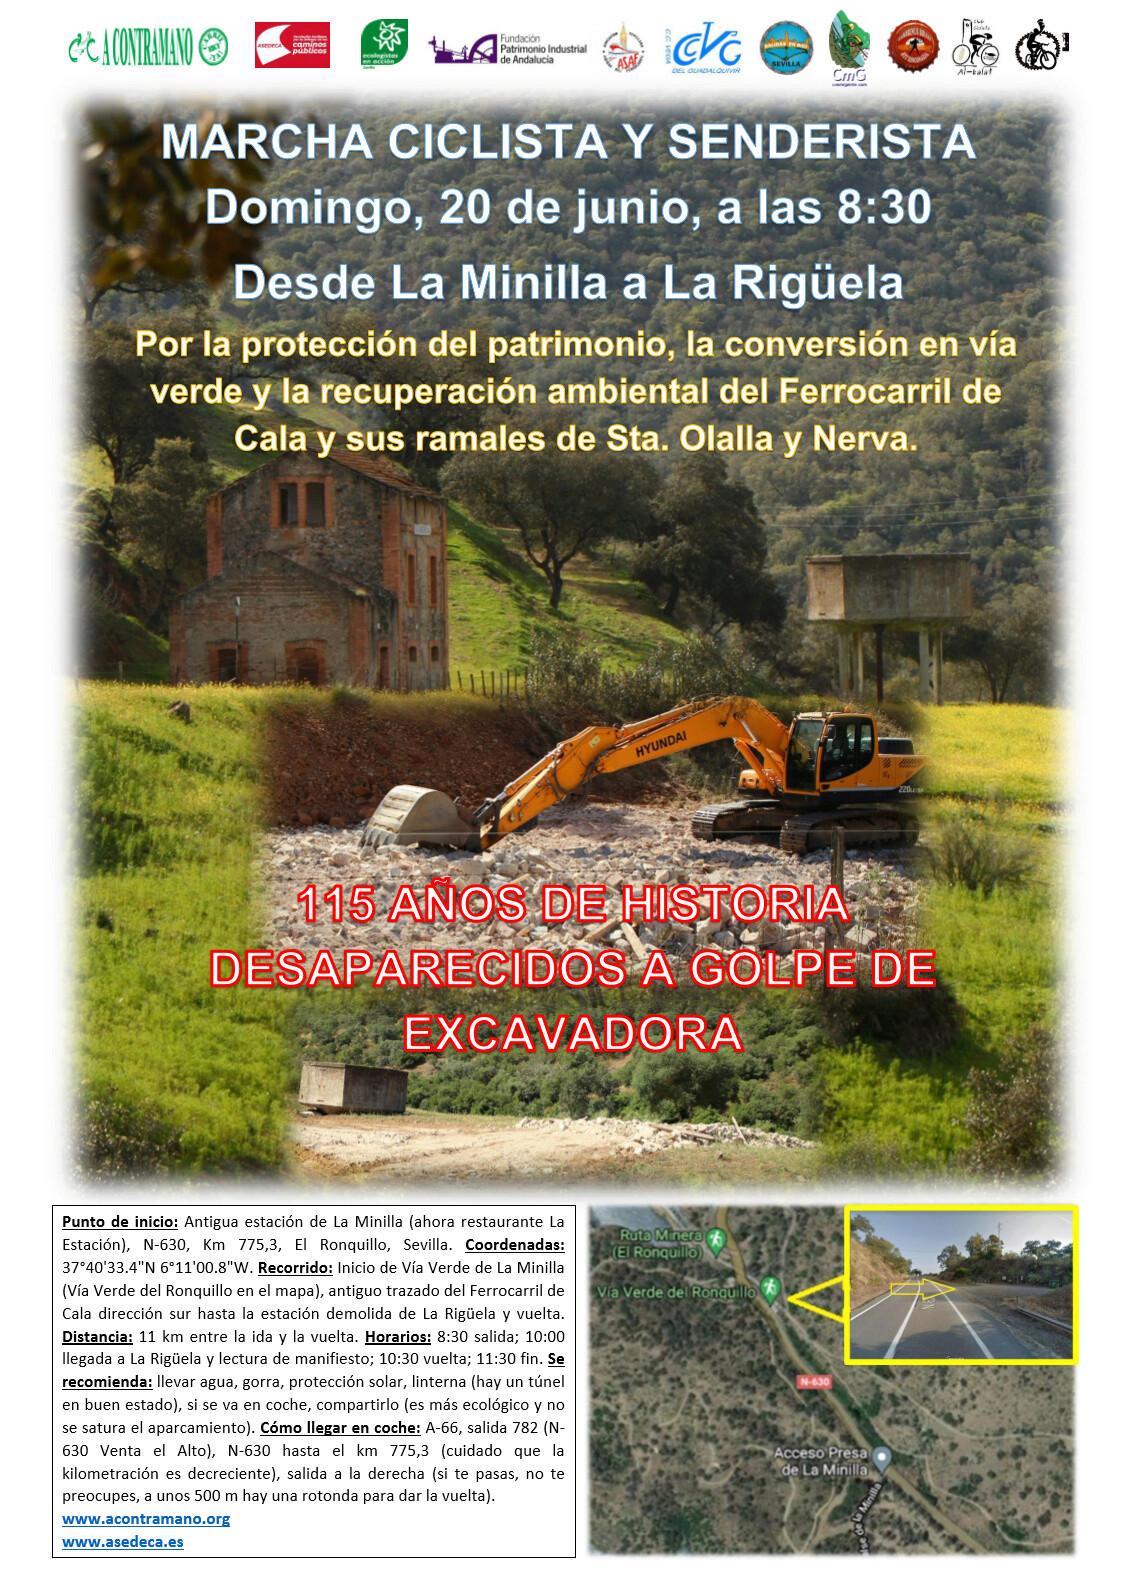 Domingo 20/6/21 Marcha ciclo-senderista La Minilla La Rigüela 2021_010